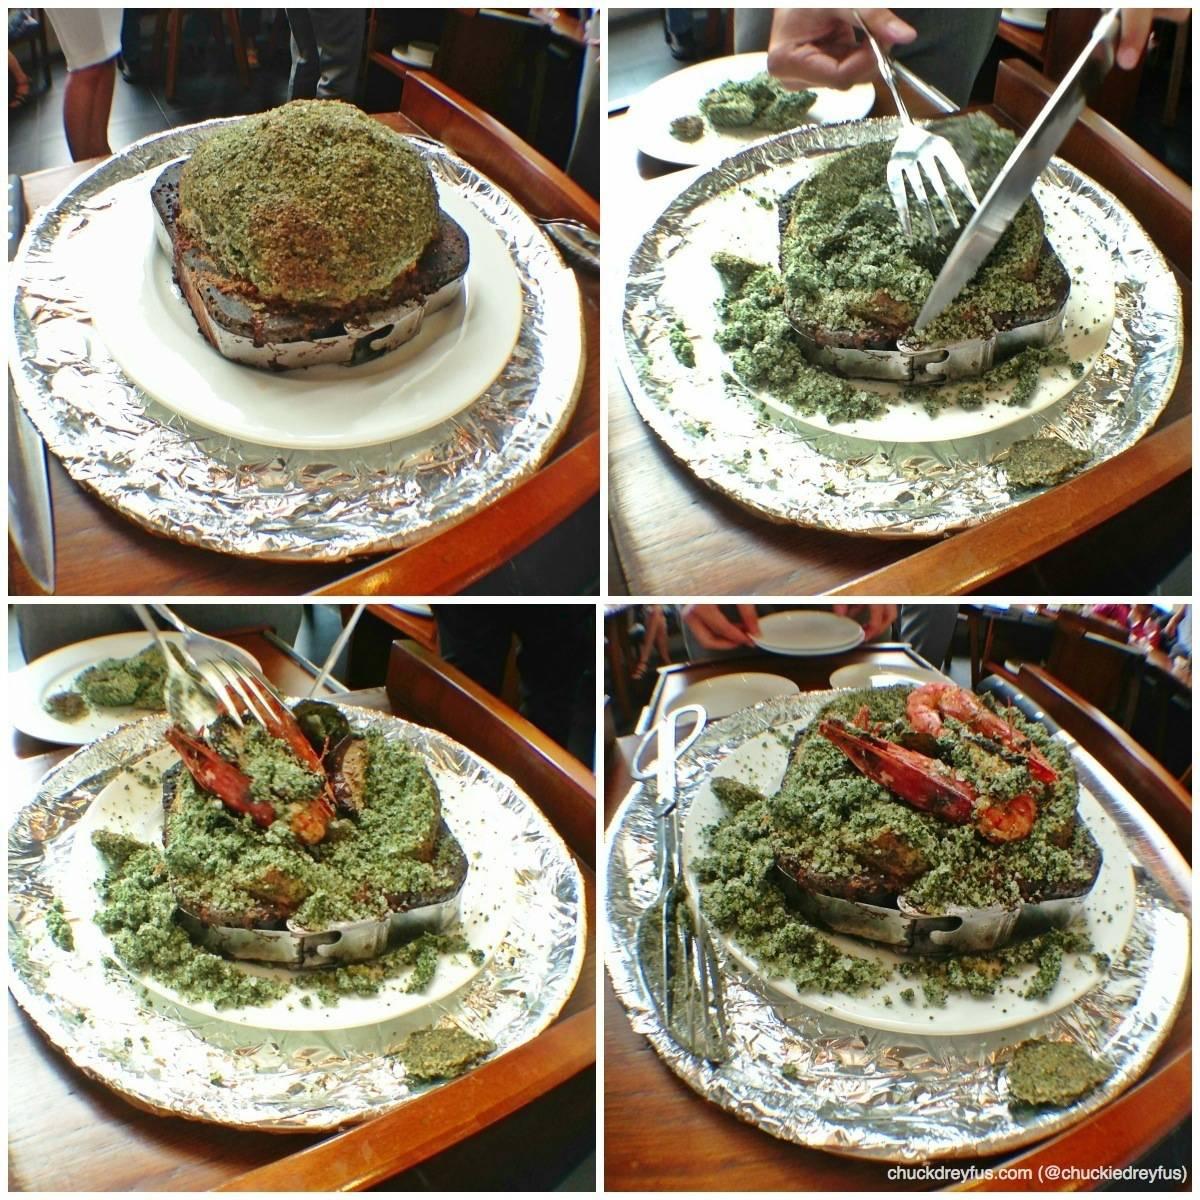 King Prawn with Mushrooms Wrapped in Seaweed Salt